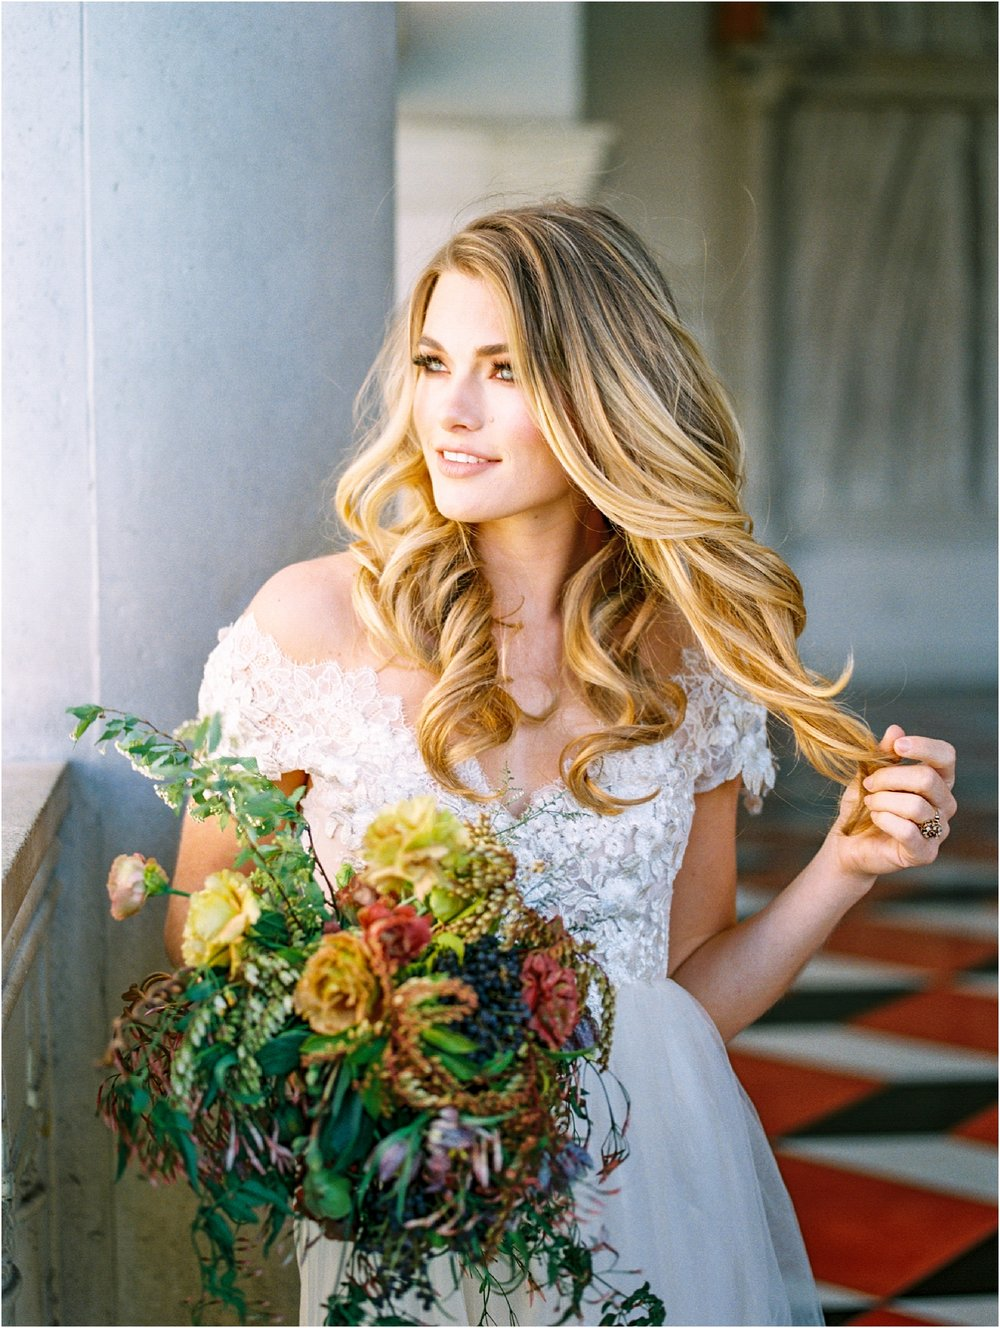 Lisa Silva Photography- Ponte Vedra Beach, St. Augustine and Jacksonville, Florida Fine Art Film Wedding and Boudoir Photography- Fine Art Film Bridal Editorial at the Venitian, Las Vegas_0014.jpg